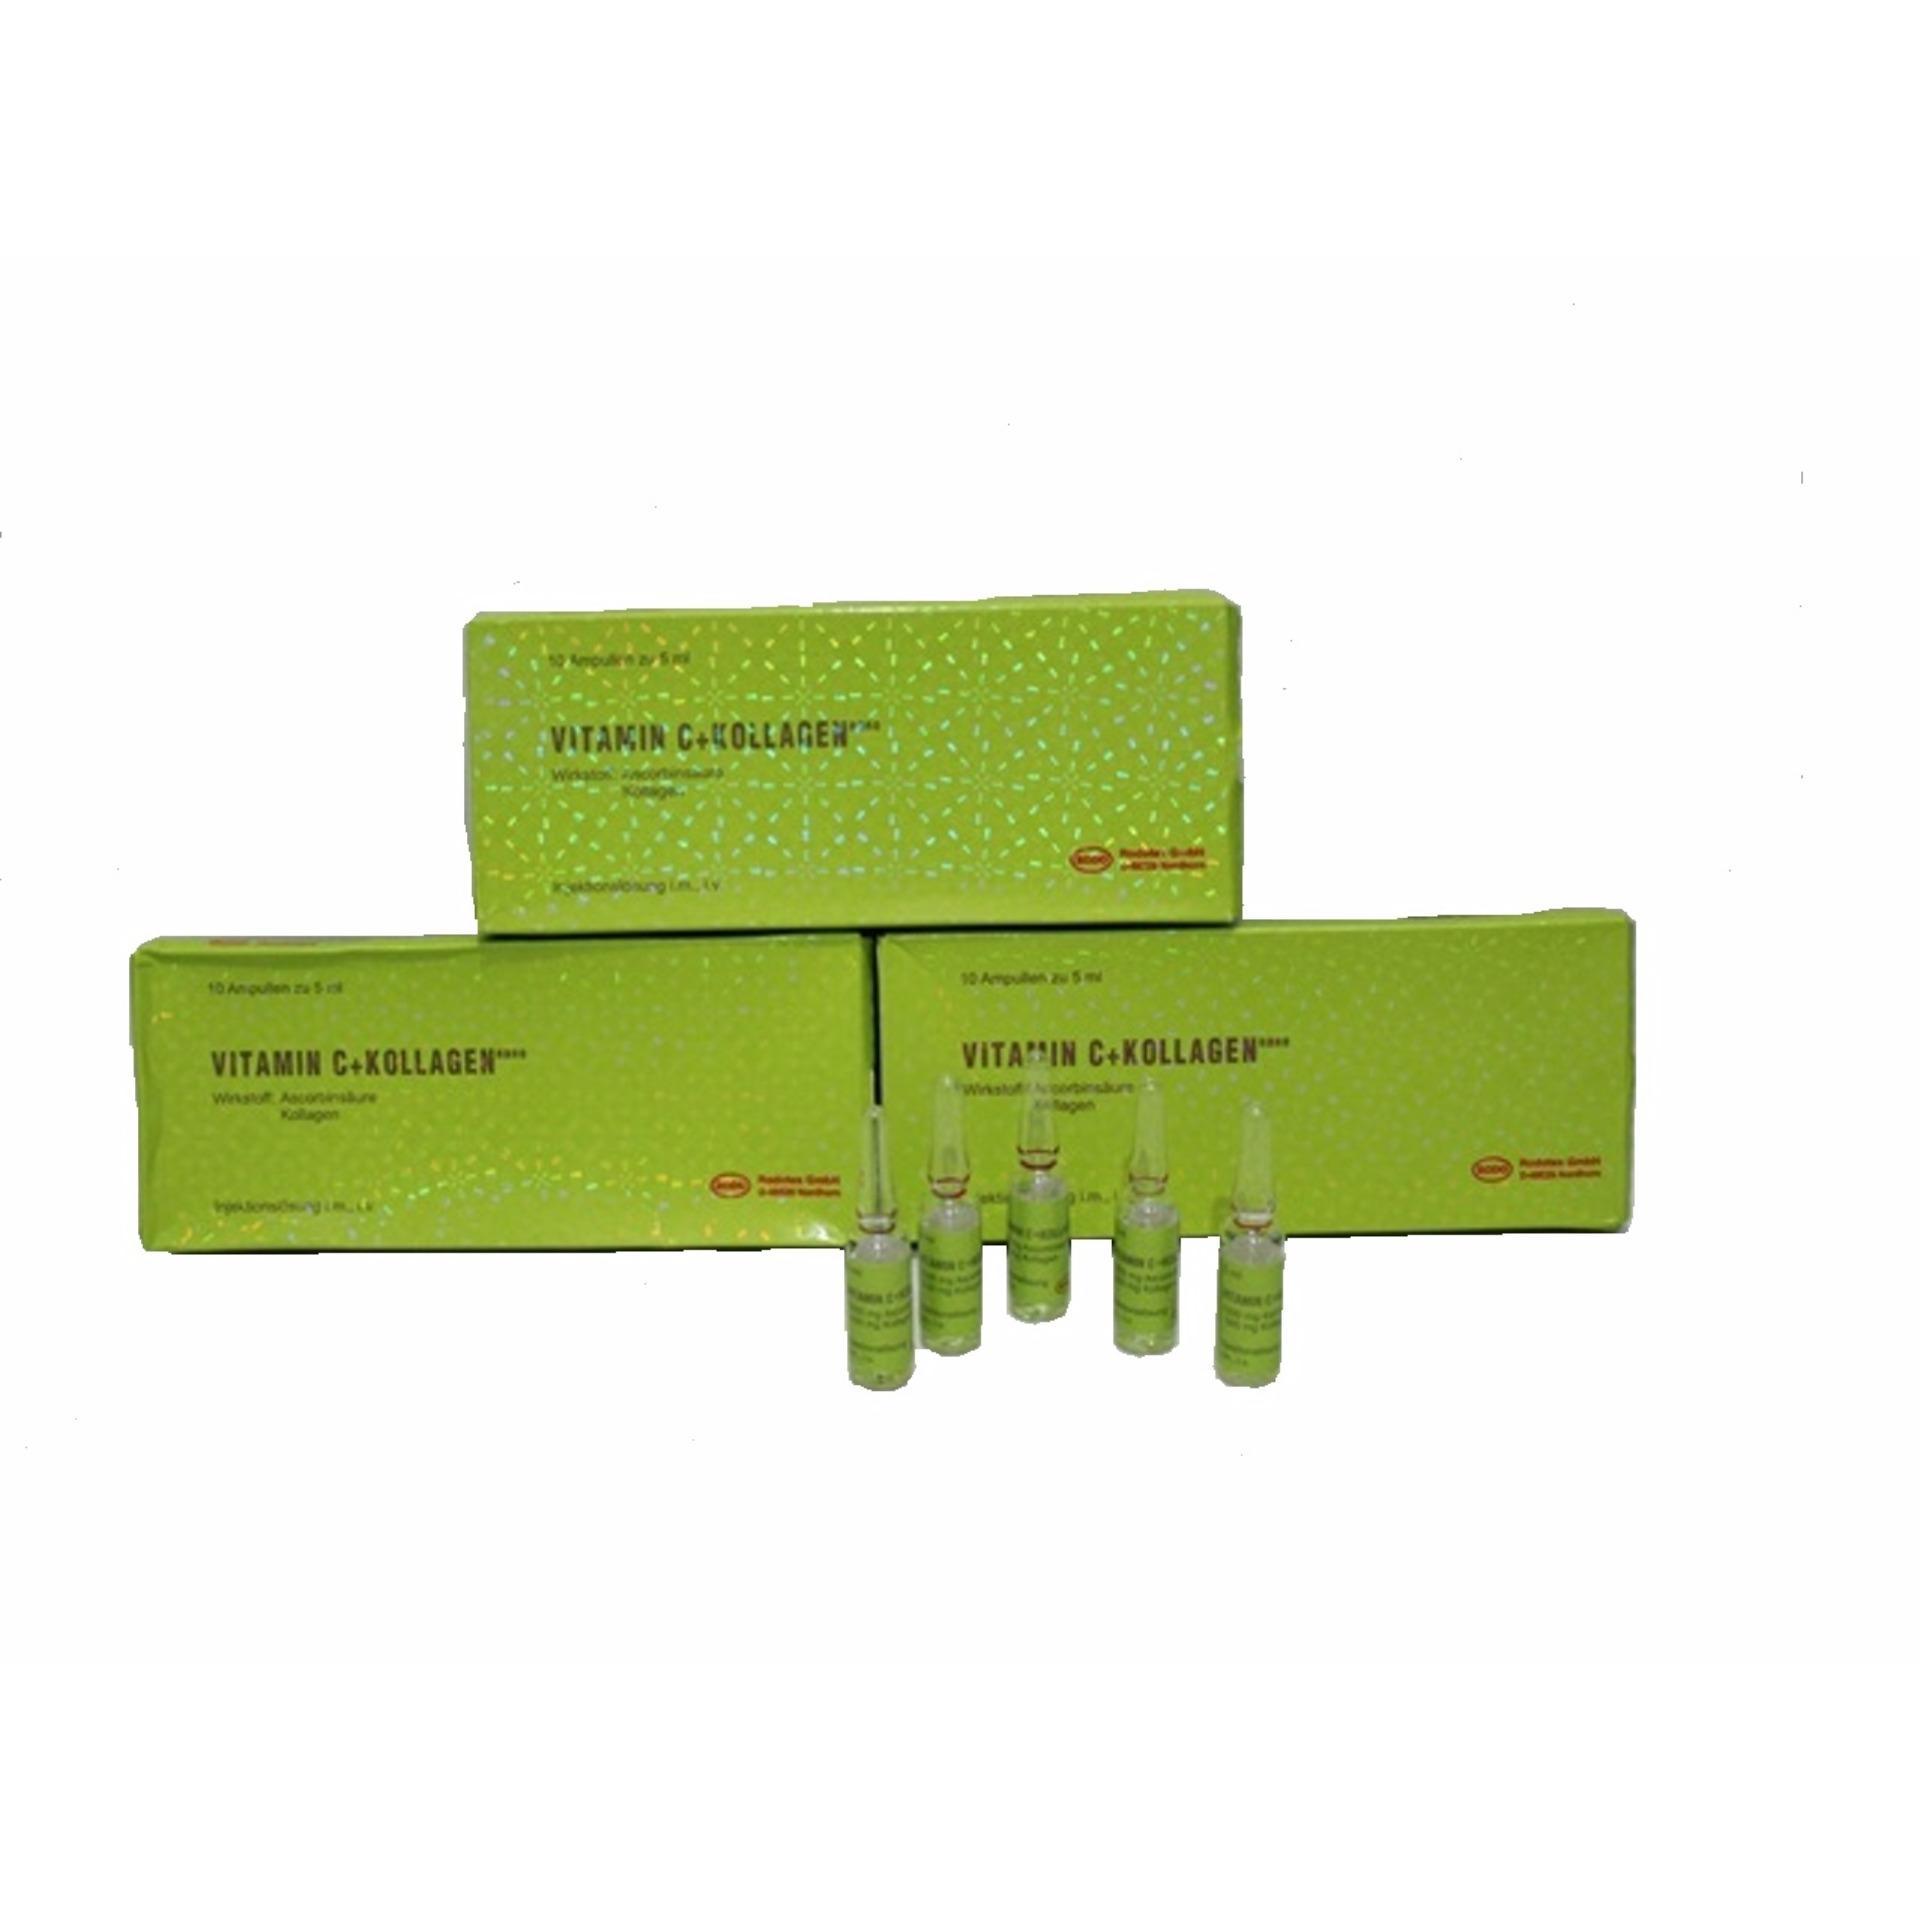 ... Rodotex Nano hijau ORIGINAL paket 2 box - Vitamin - C + Kollagen Original Germany ...